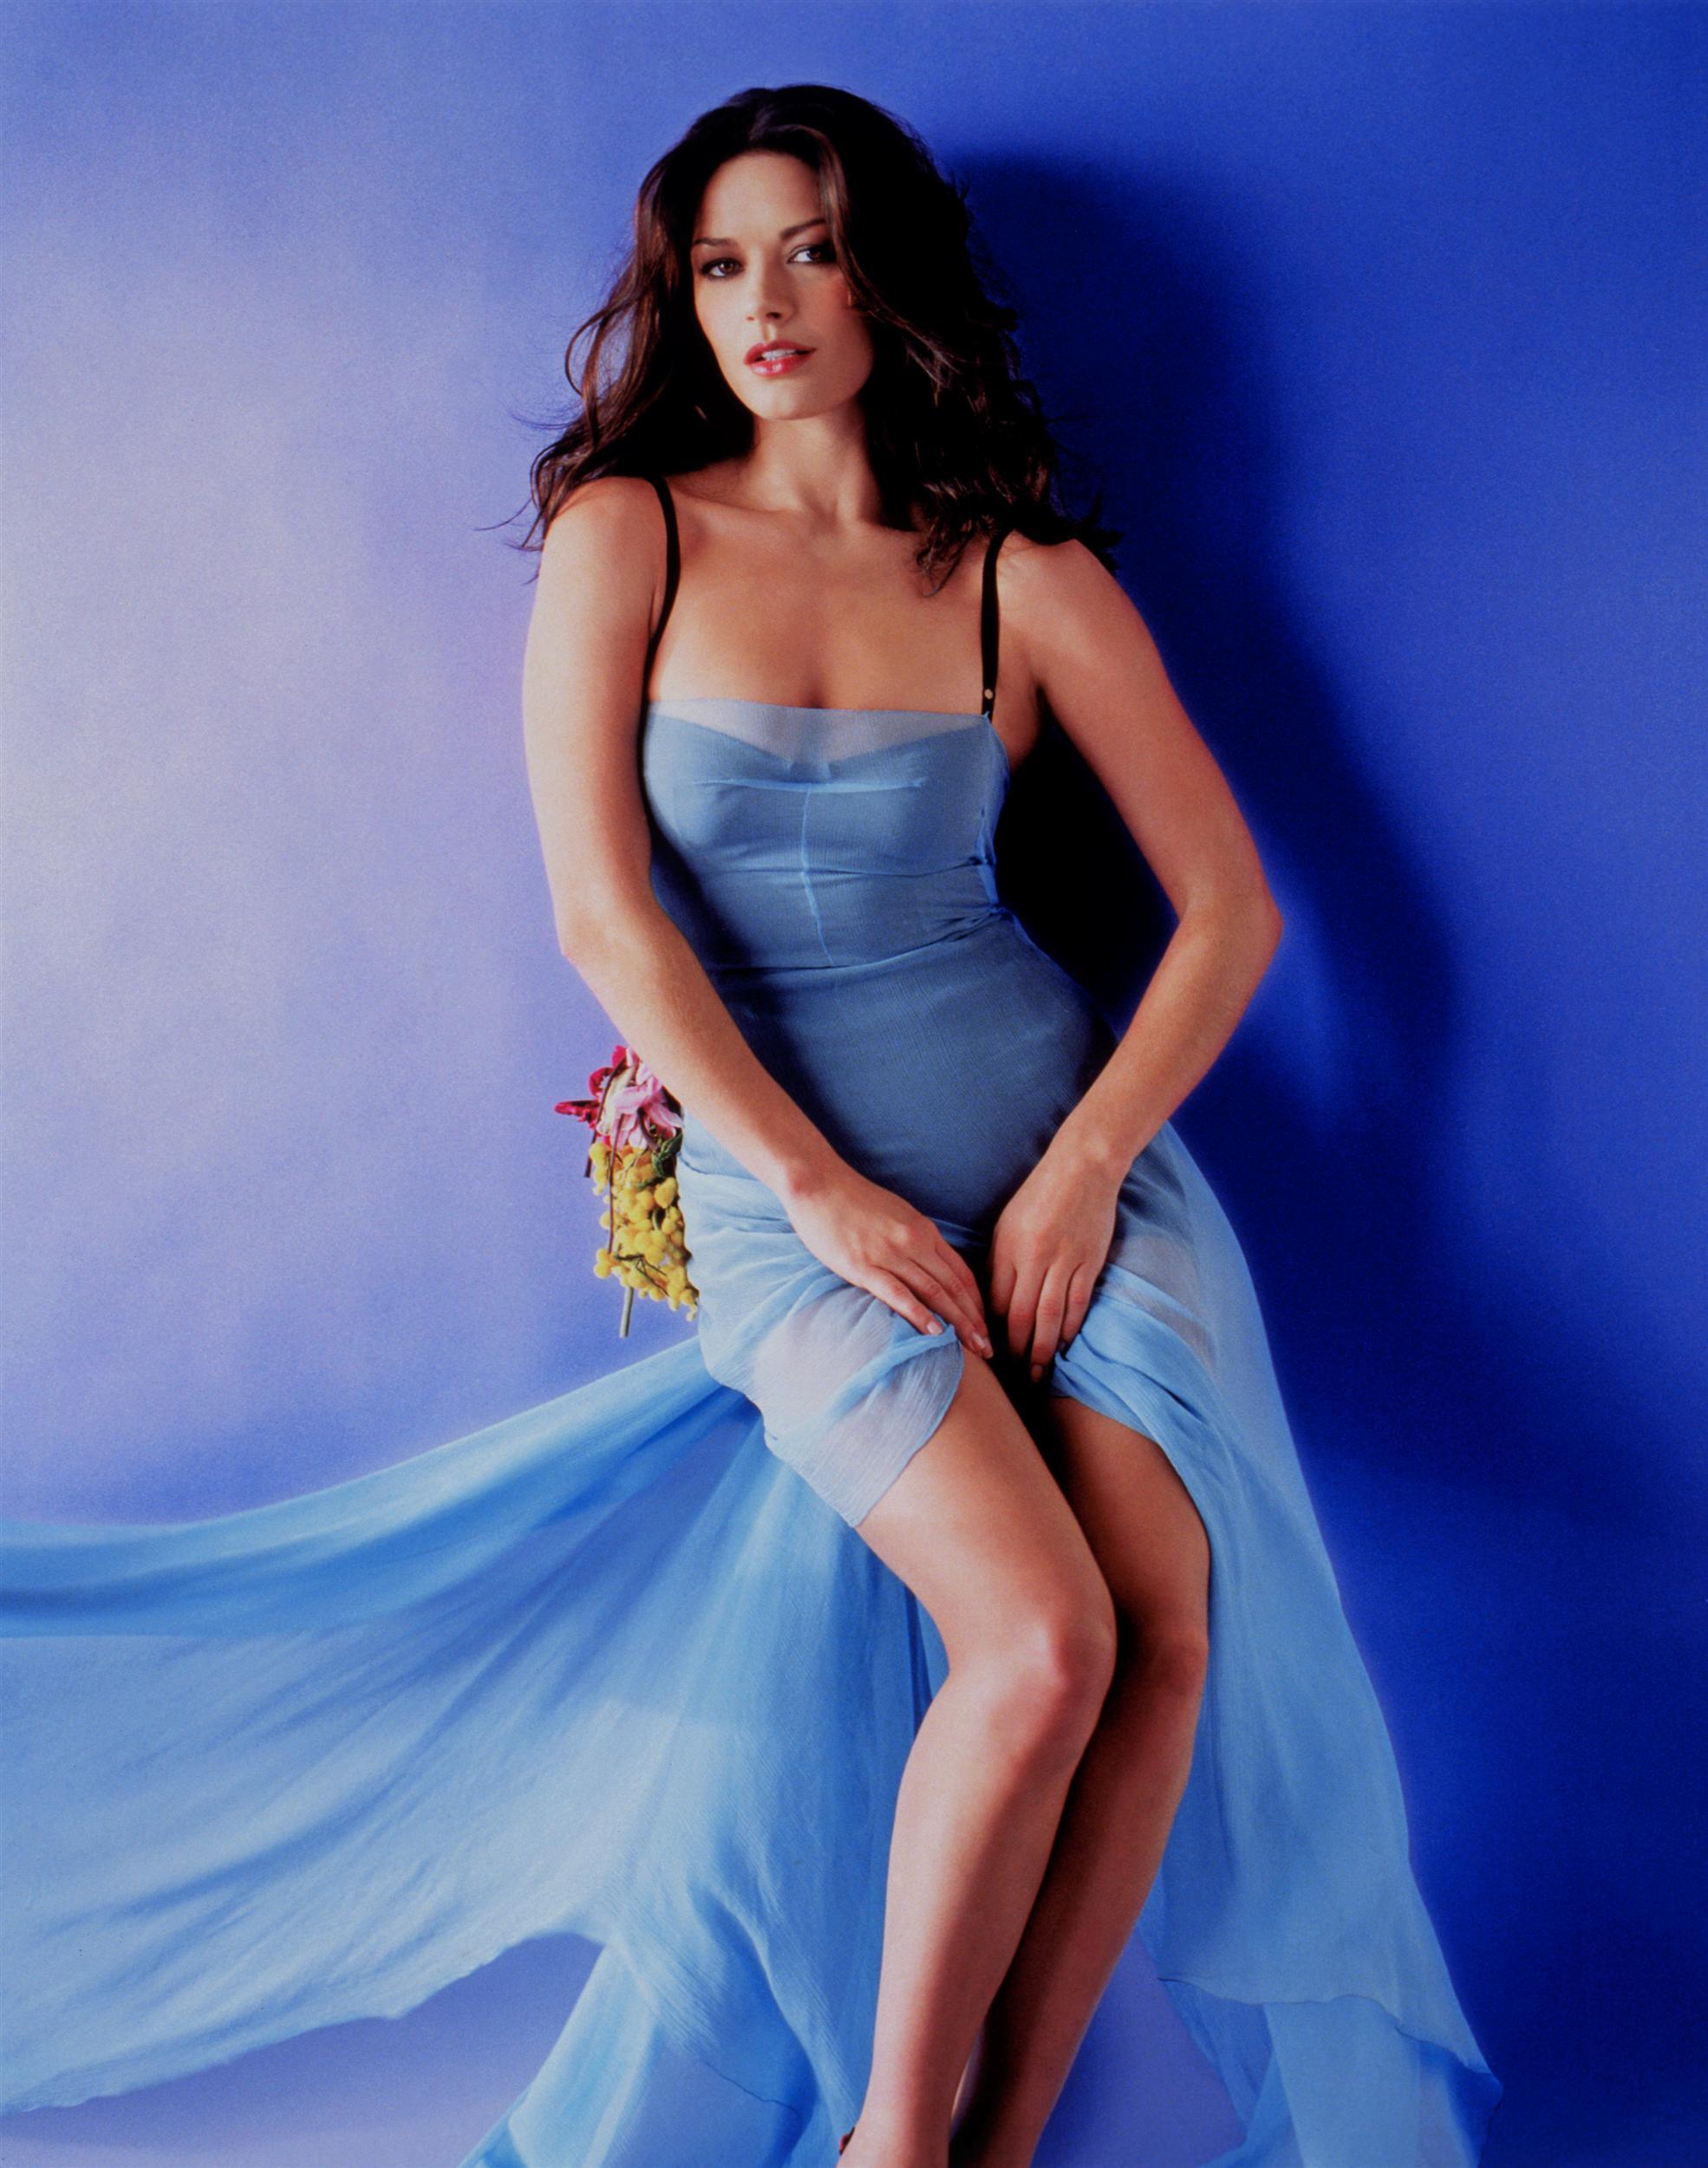 Catherine Zeta Jones | Smoking - 200 Hot Nude Sexy No